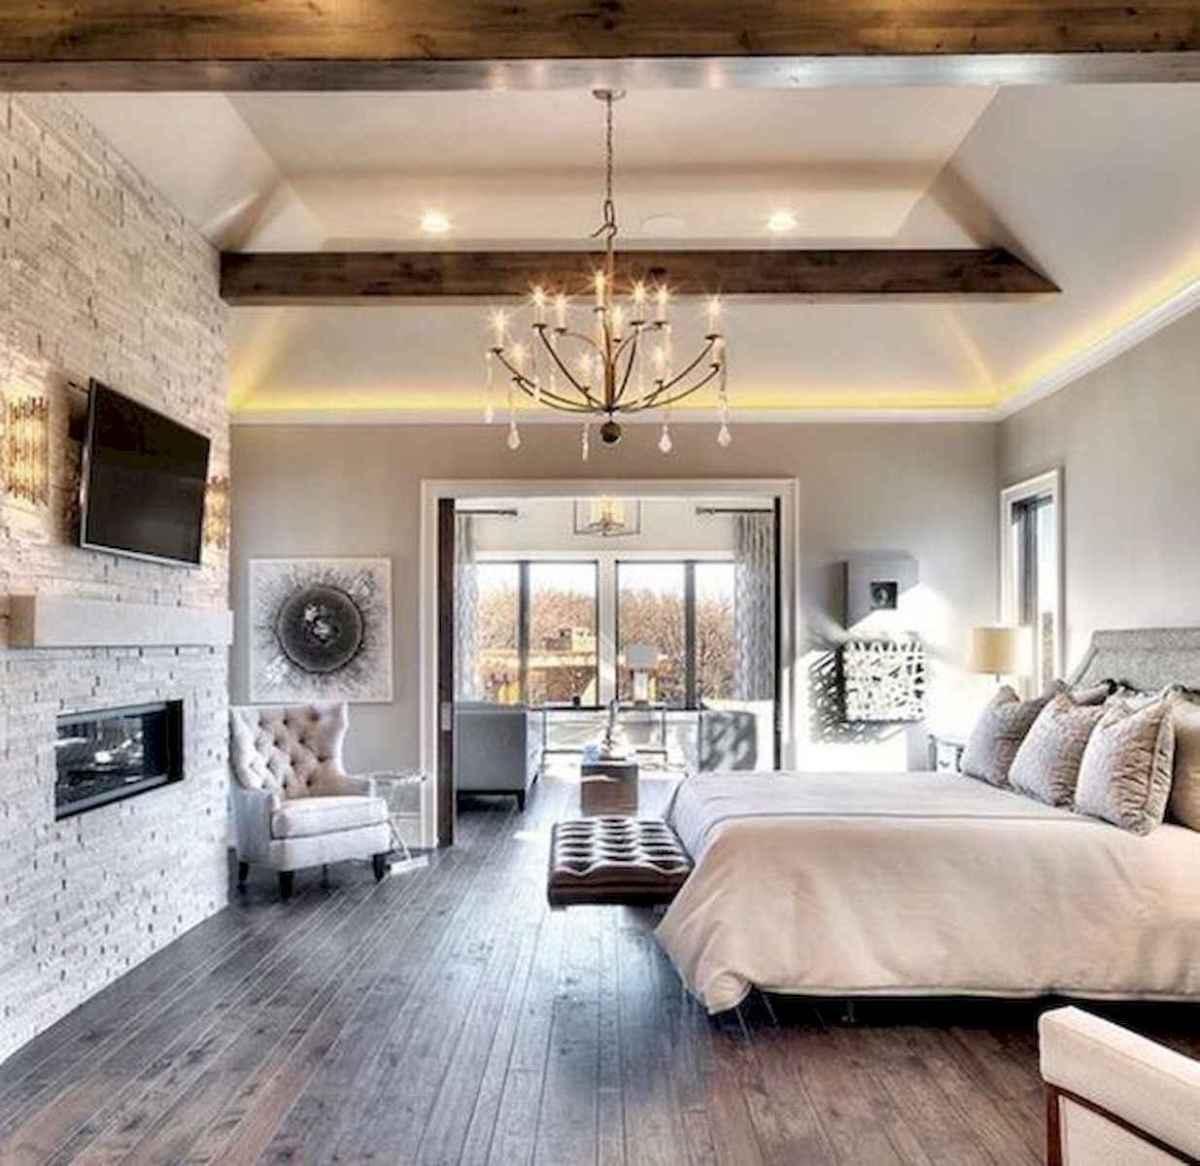 120 Awesome Farmhouse Master Bedroom Decor Ideas (6)